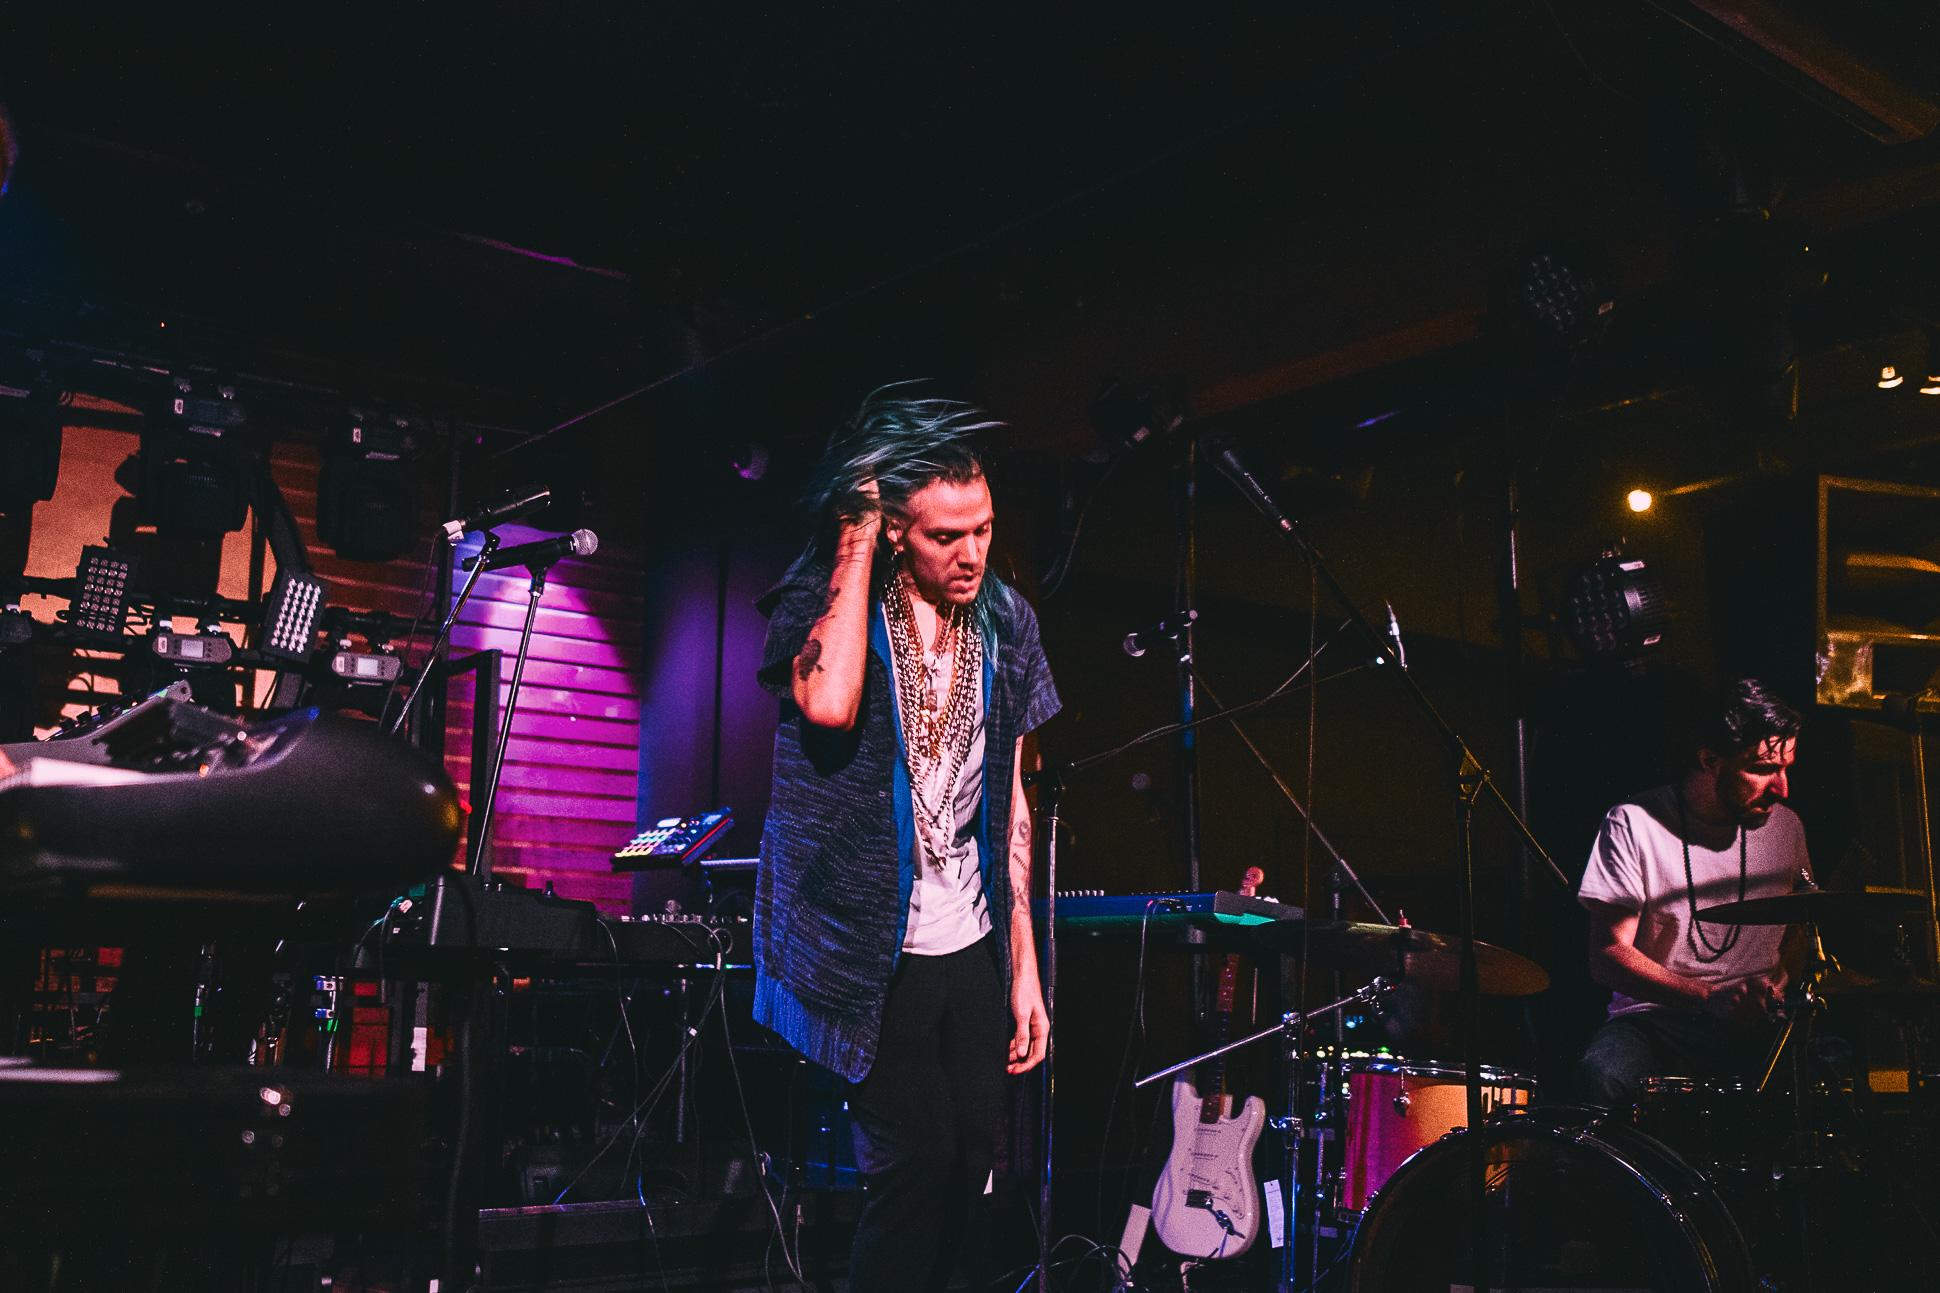 YoungAndSick-FortuneSoundClub-24-01-2019-Vancouver-08.jpg